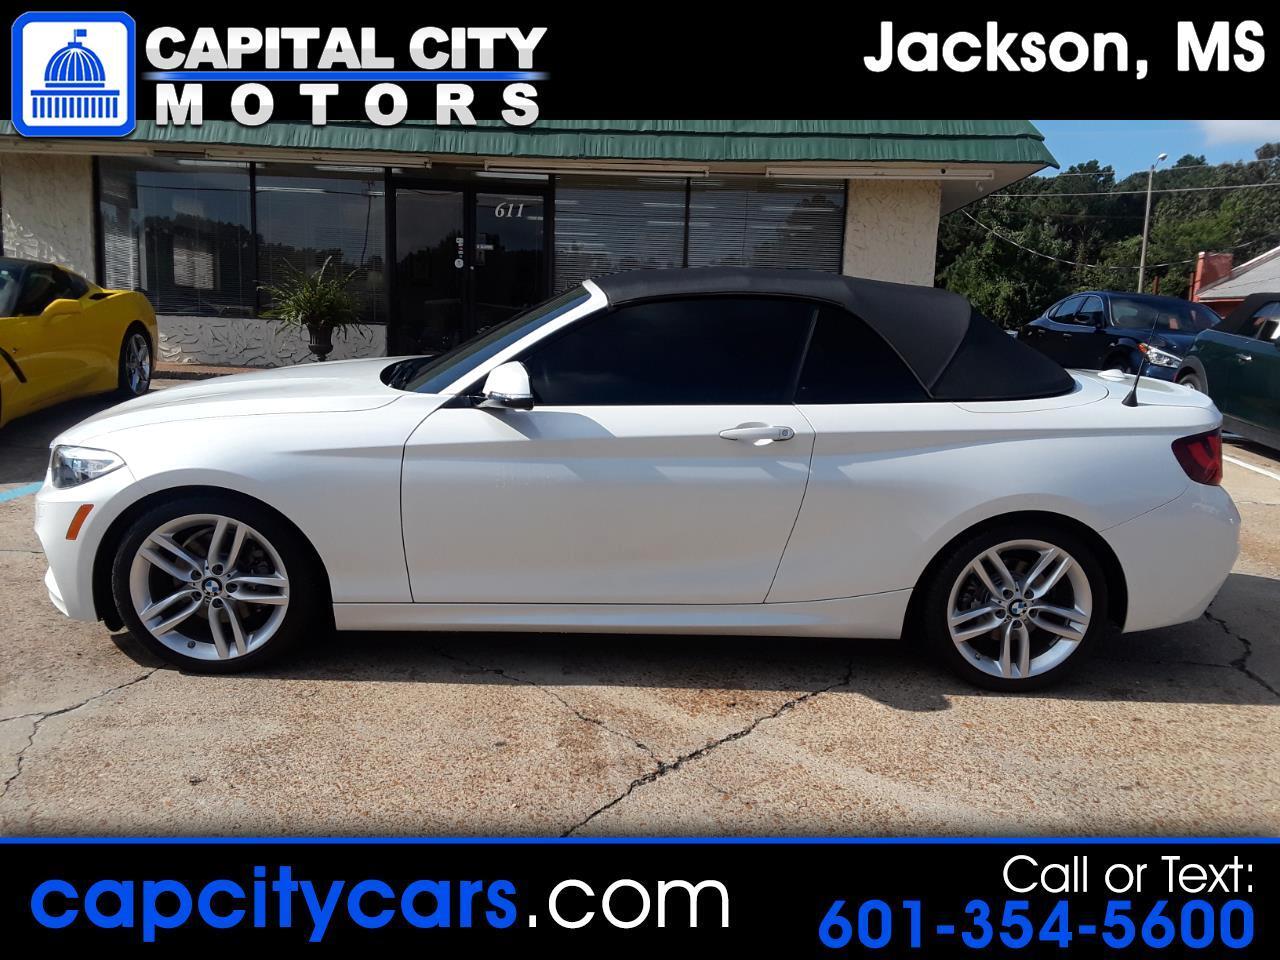 Used Cars for Sale Jackson MS 39201 Capital City Motors Jackson